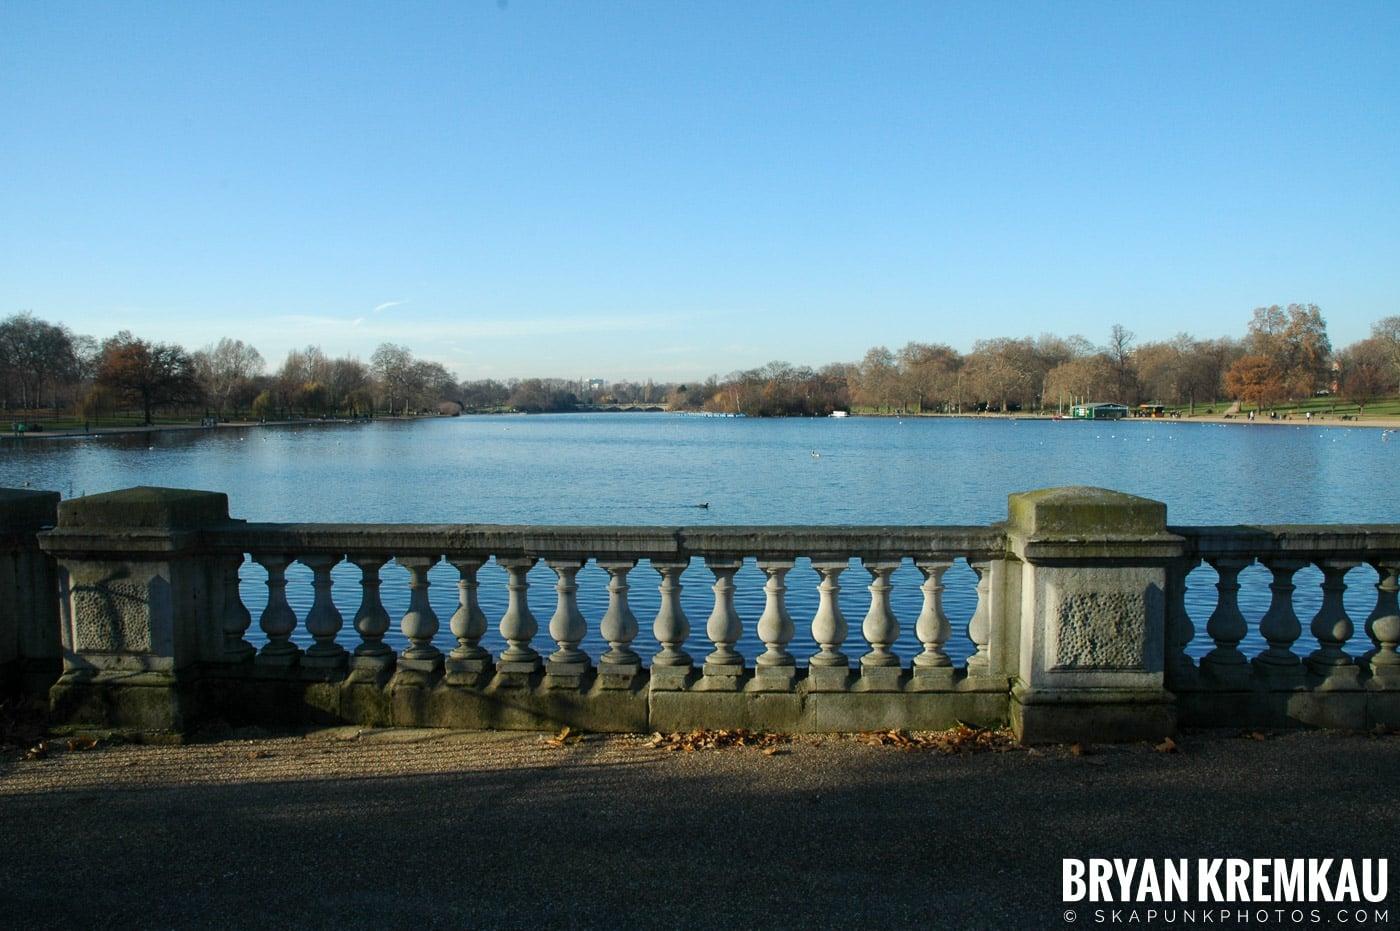 London, England - Day 3 - 12.18.05 (34)